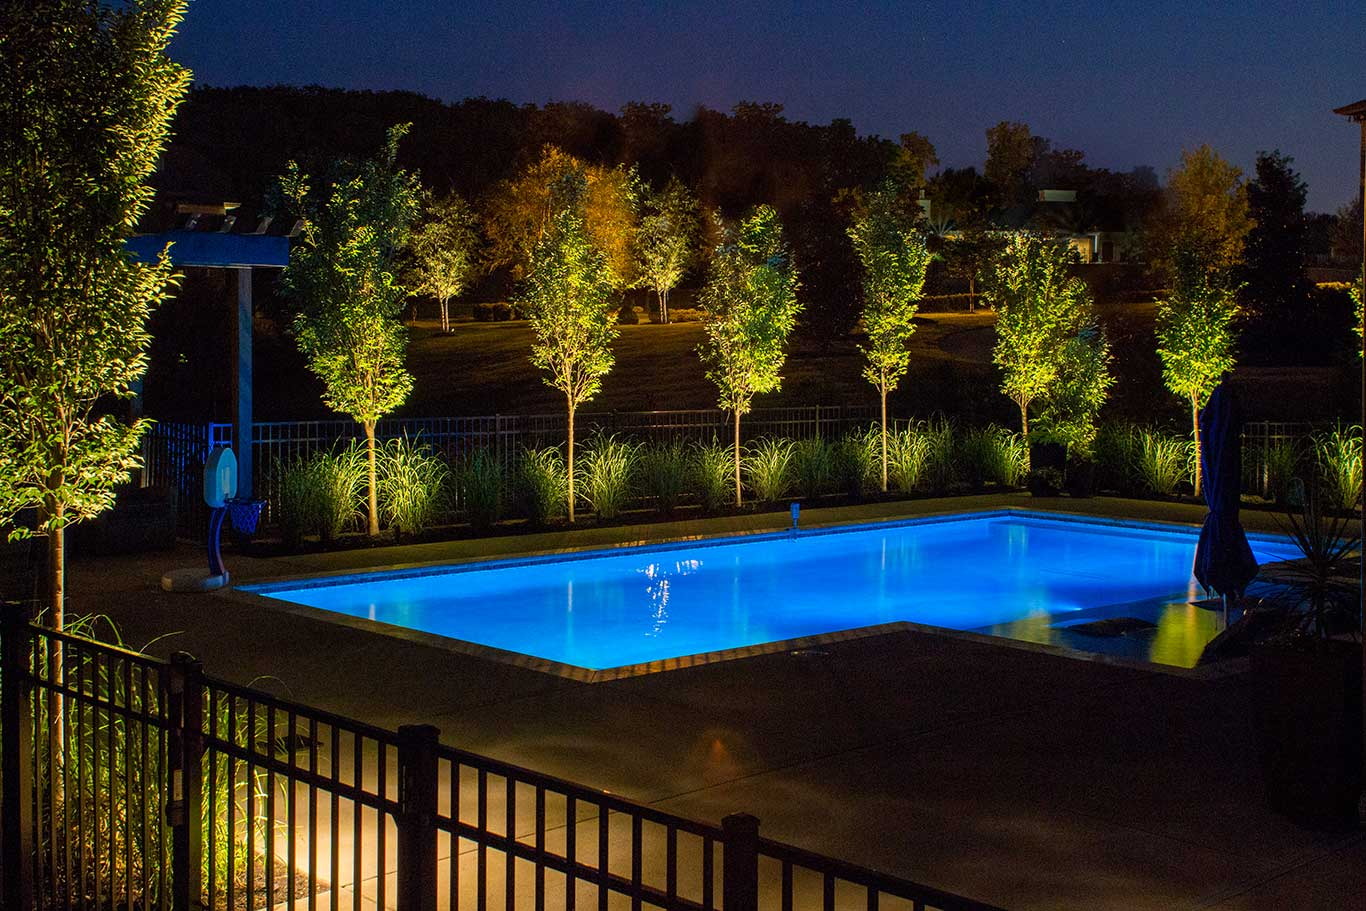 Landscape Lighting By Blue Pool